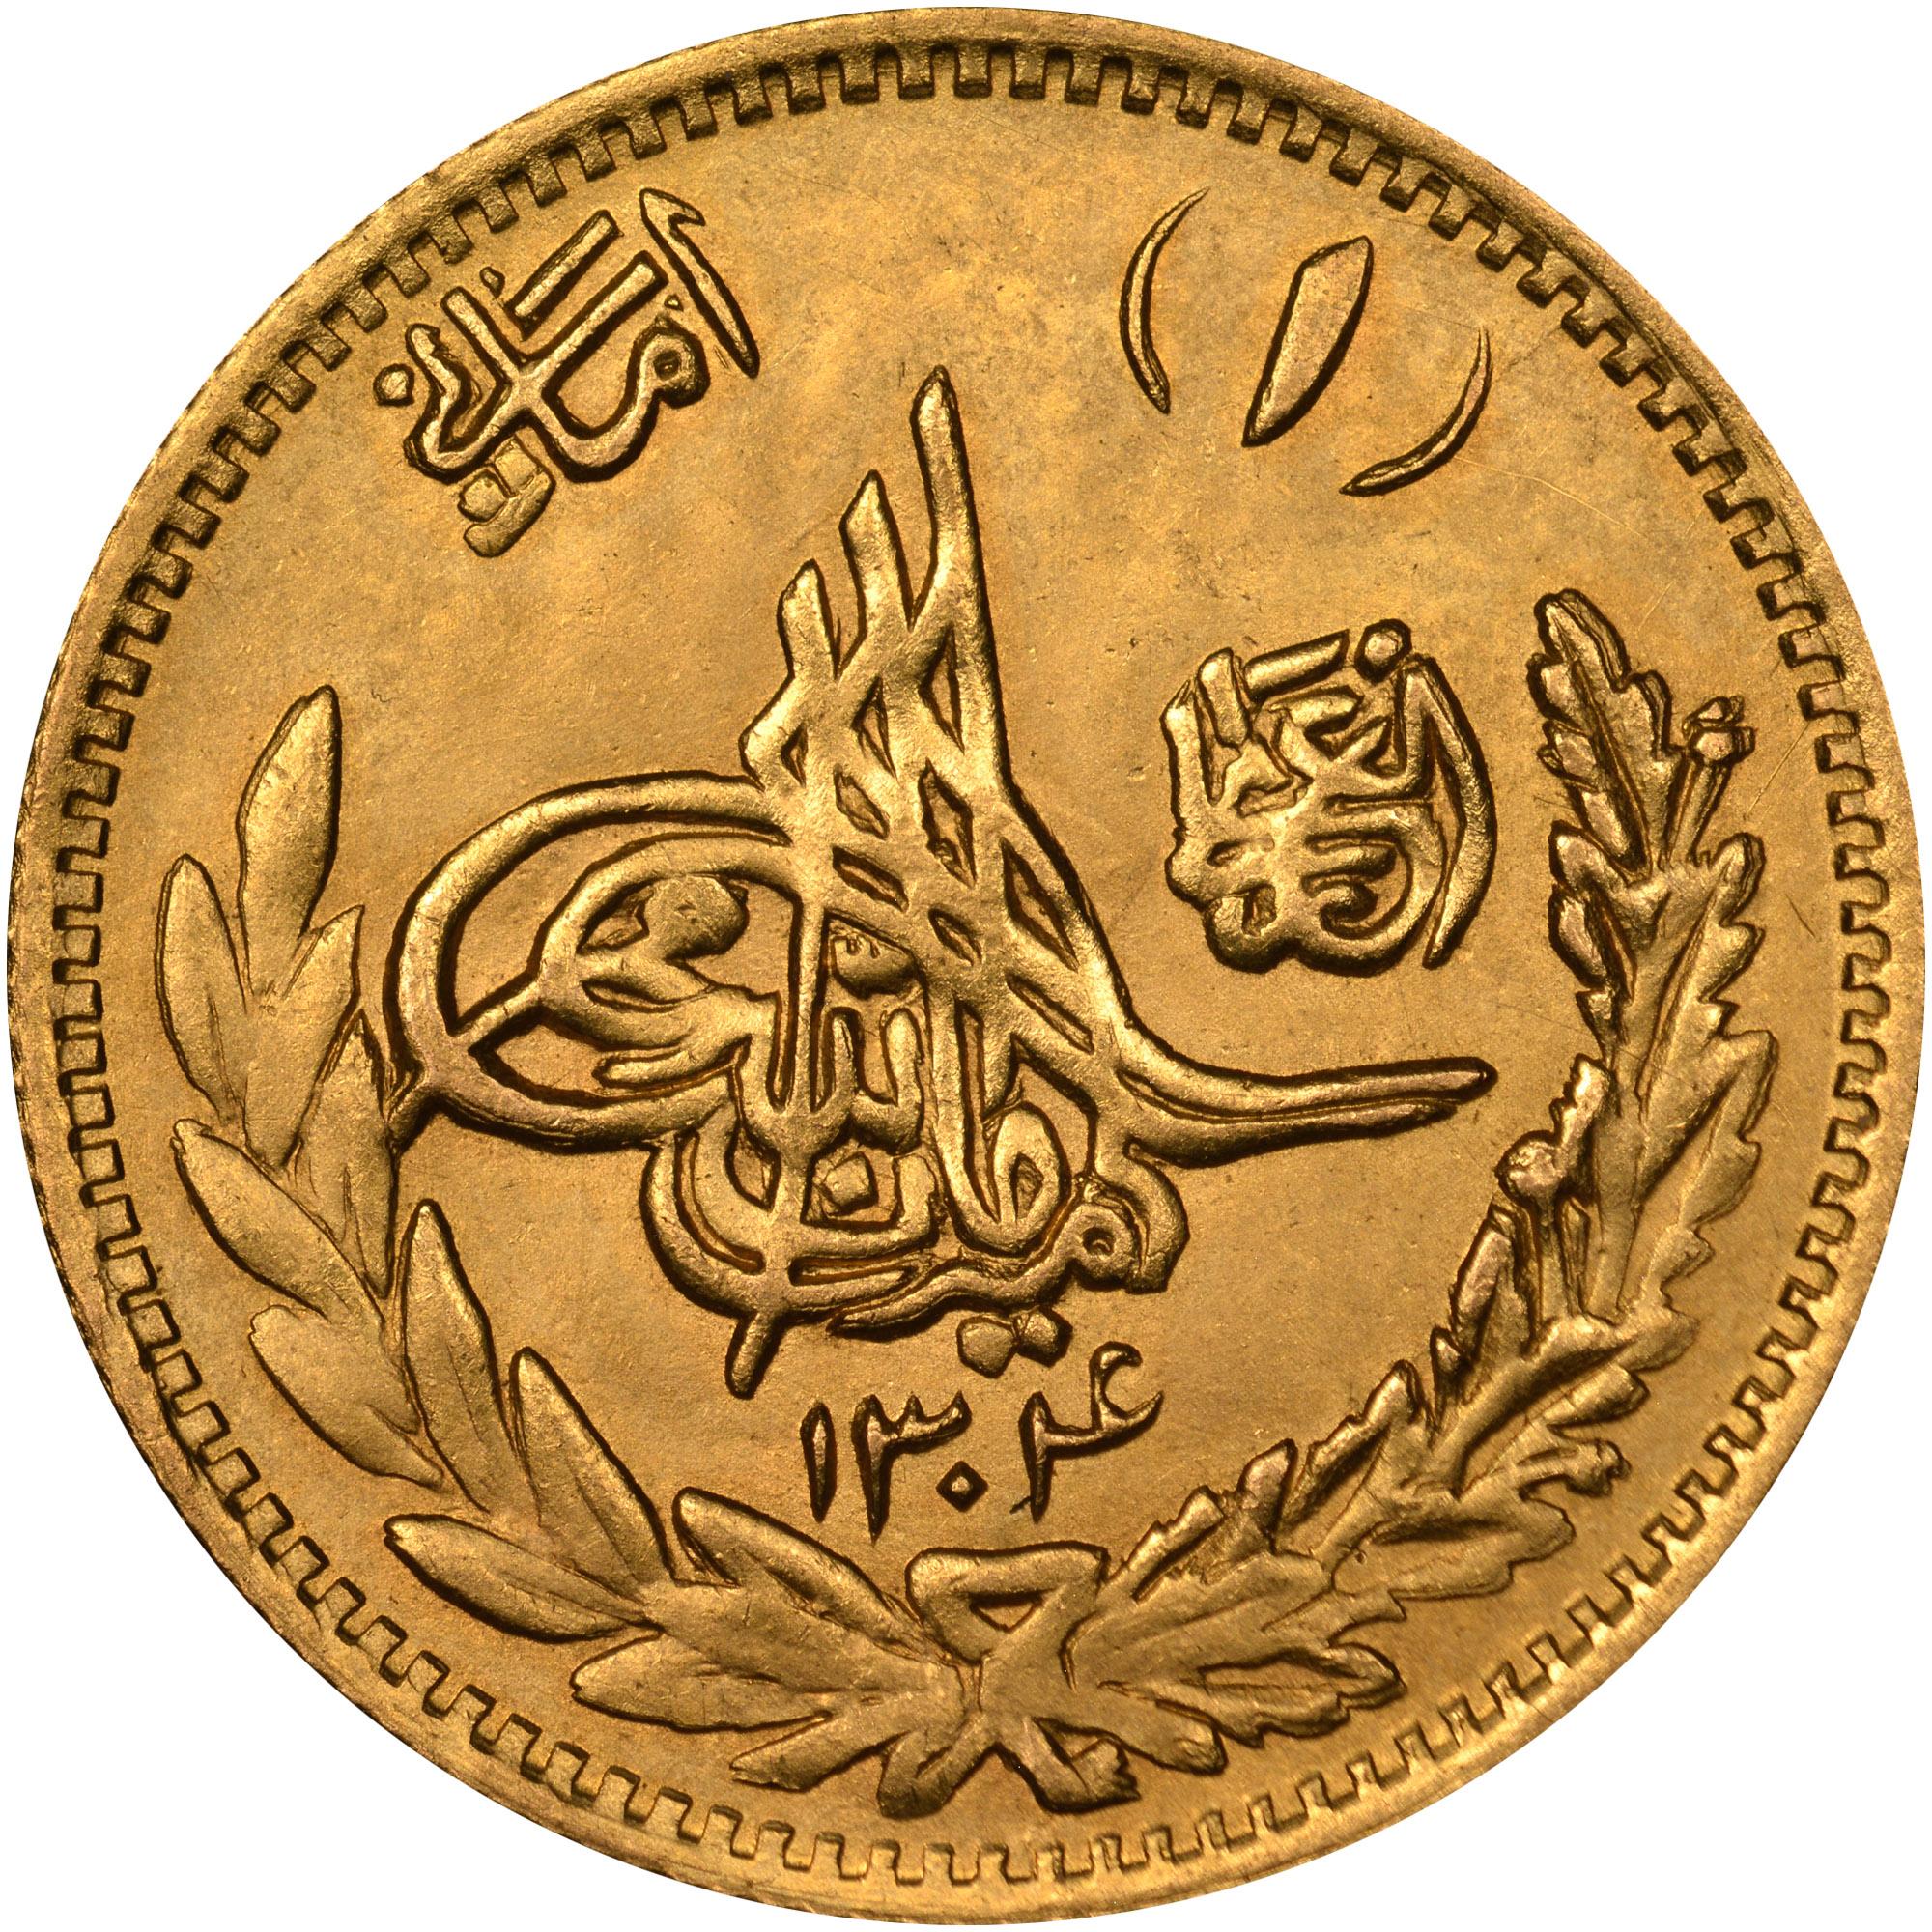 1304/7 (1925)-1306/9 (1927) Afghanistan Amani obverse